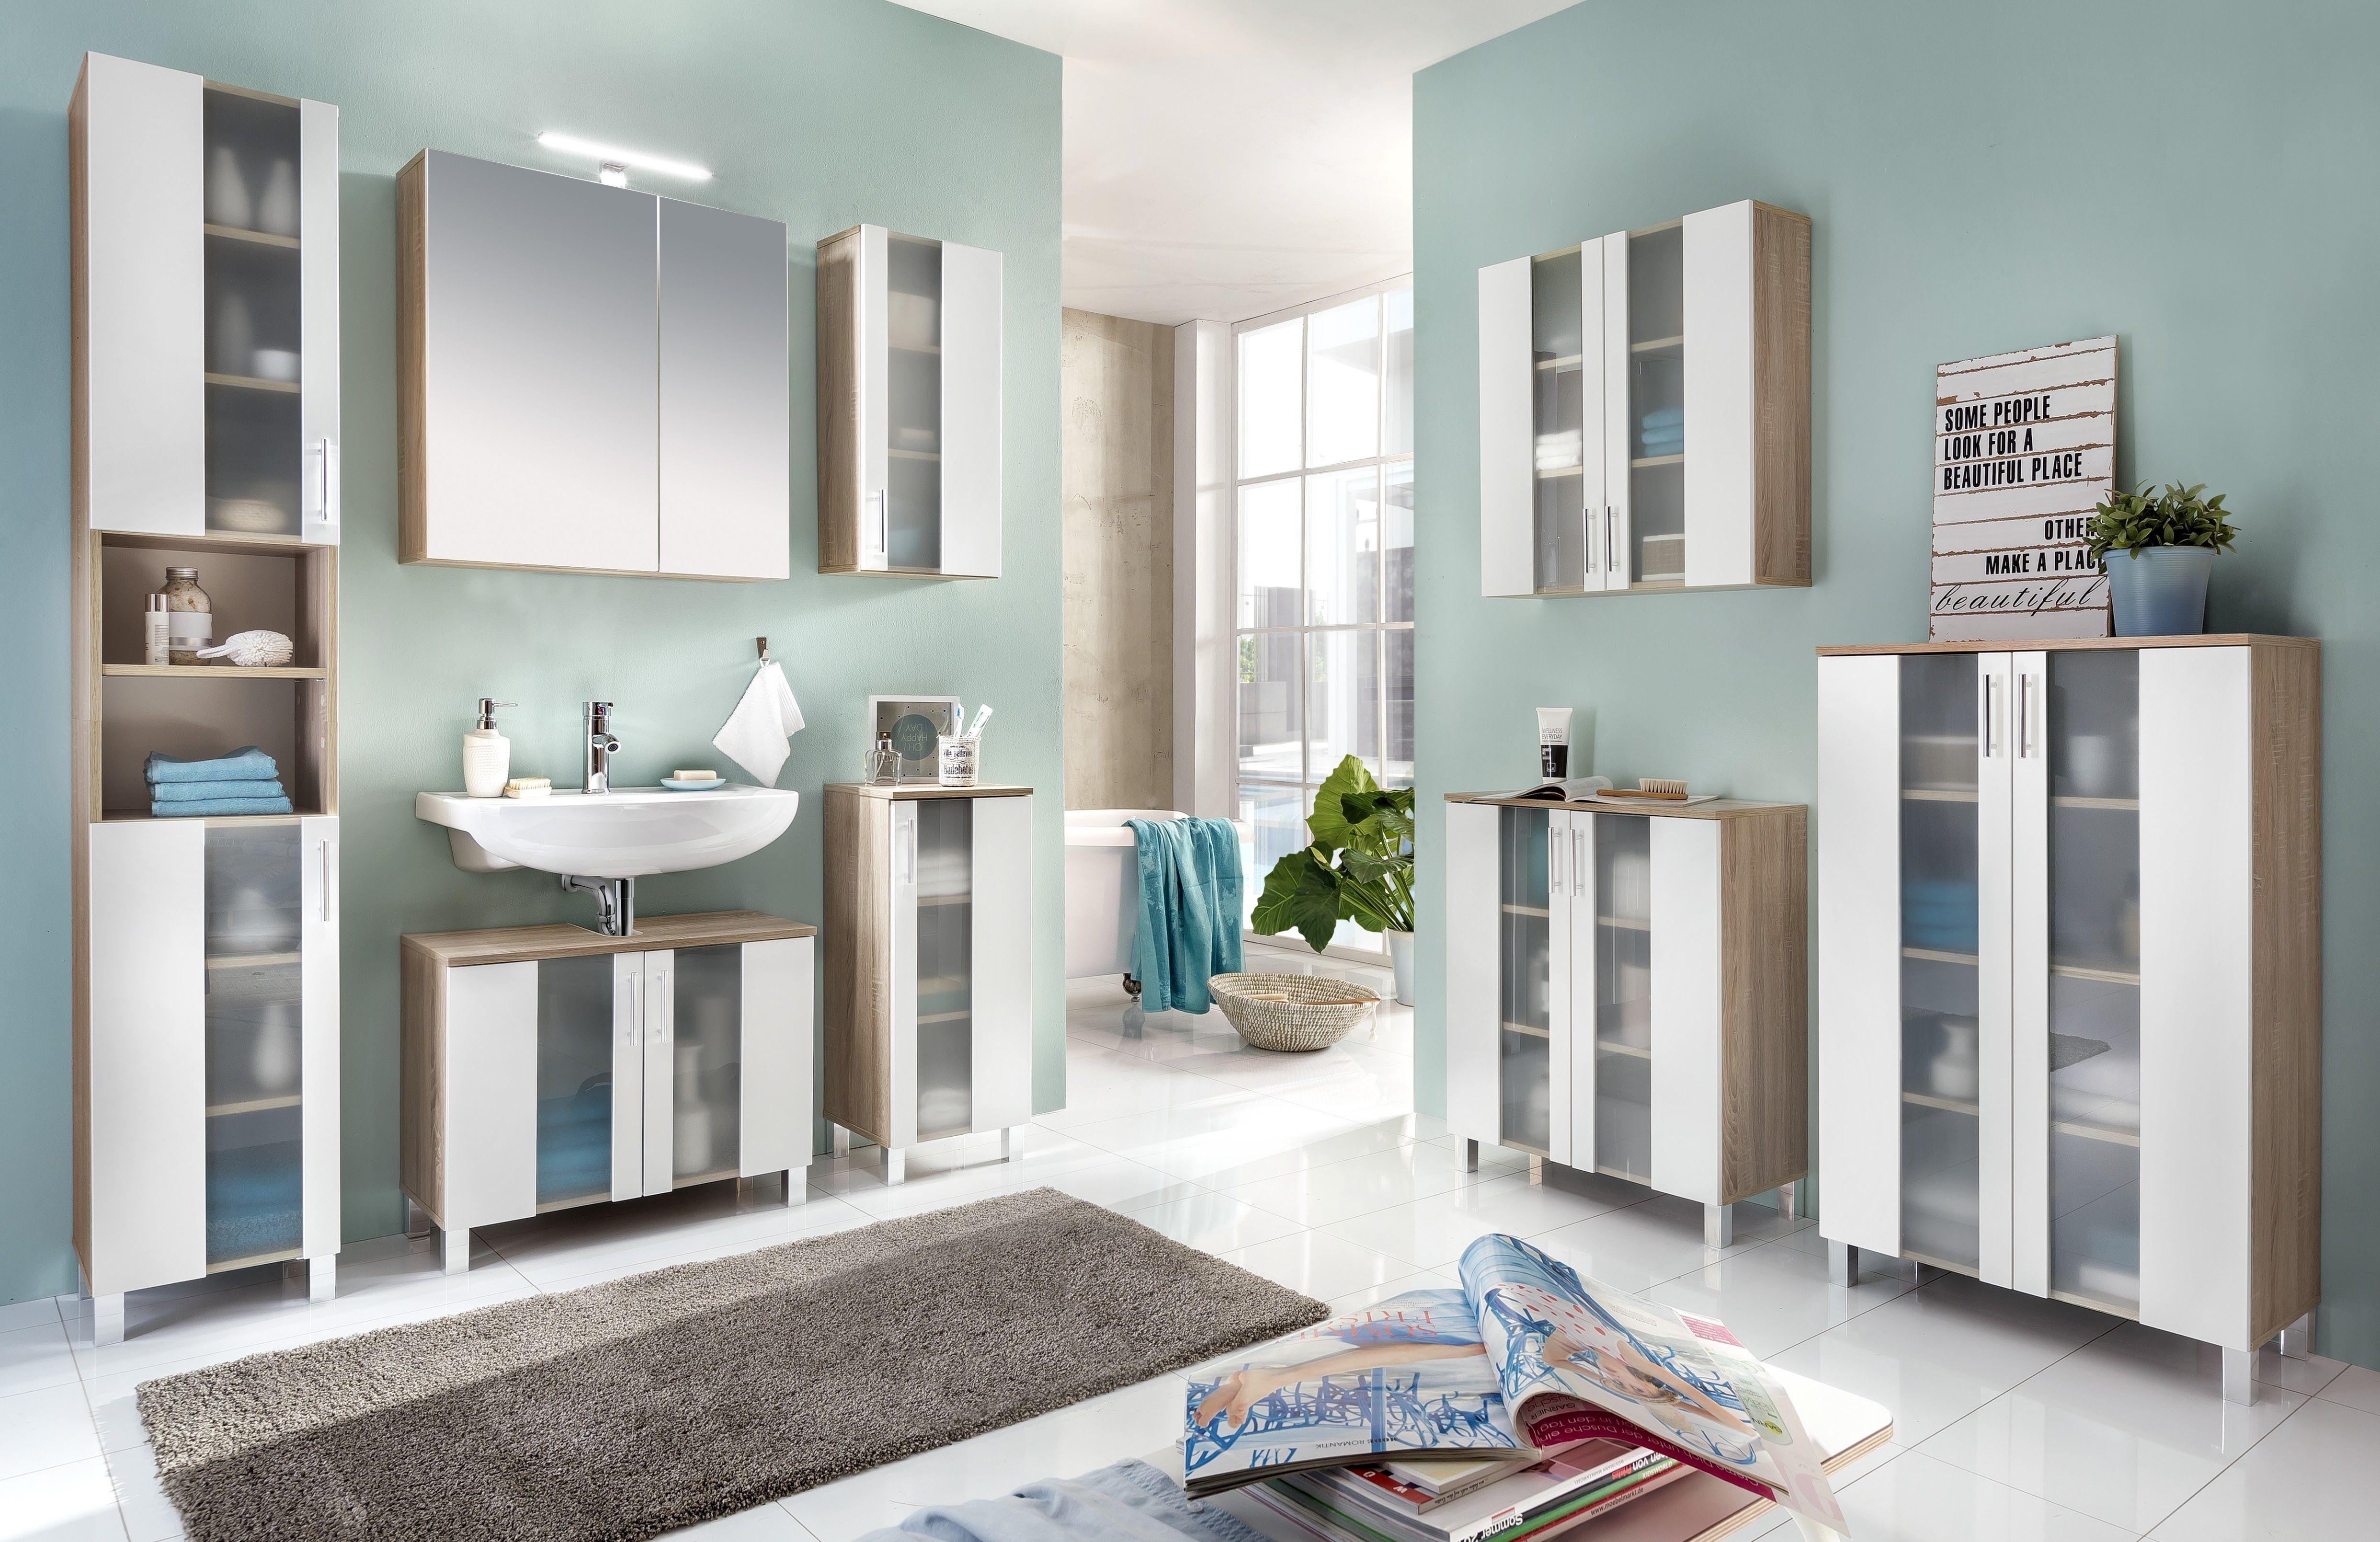 Badezimmer Komplettset ~ Badezimmer set weiss eiche sägerau woody 93 01056 holz modern